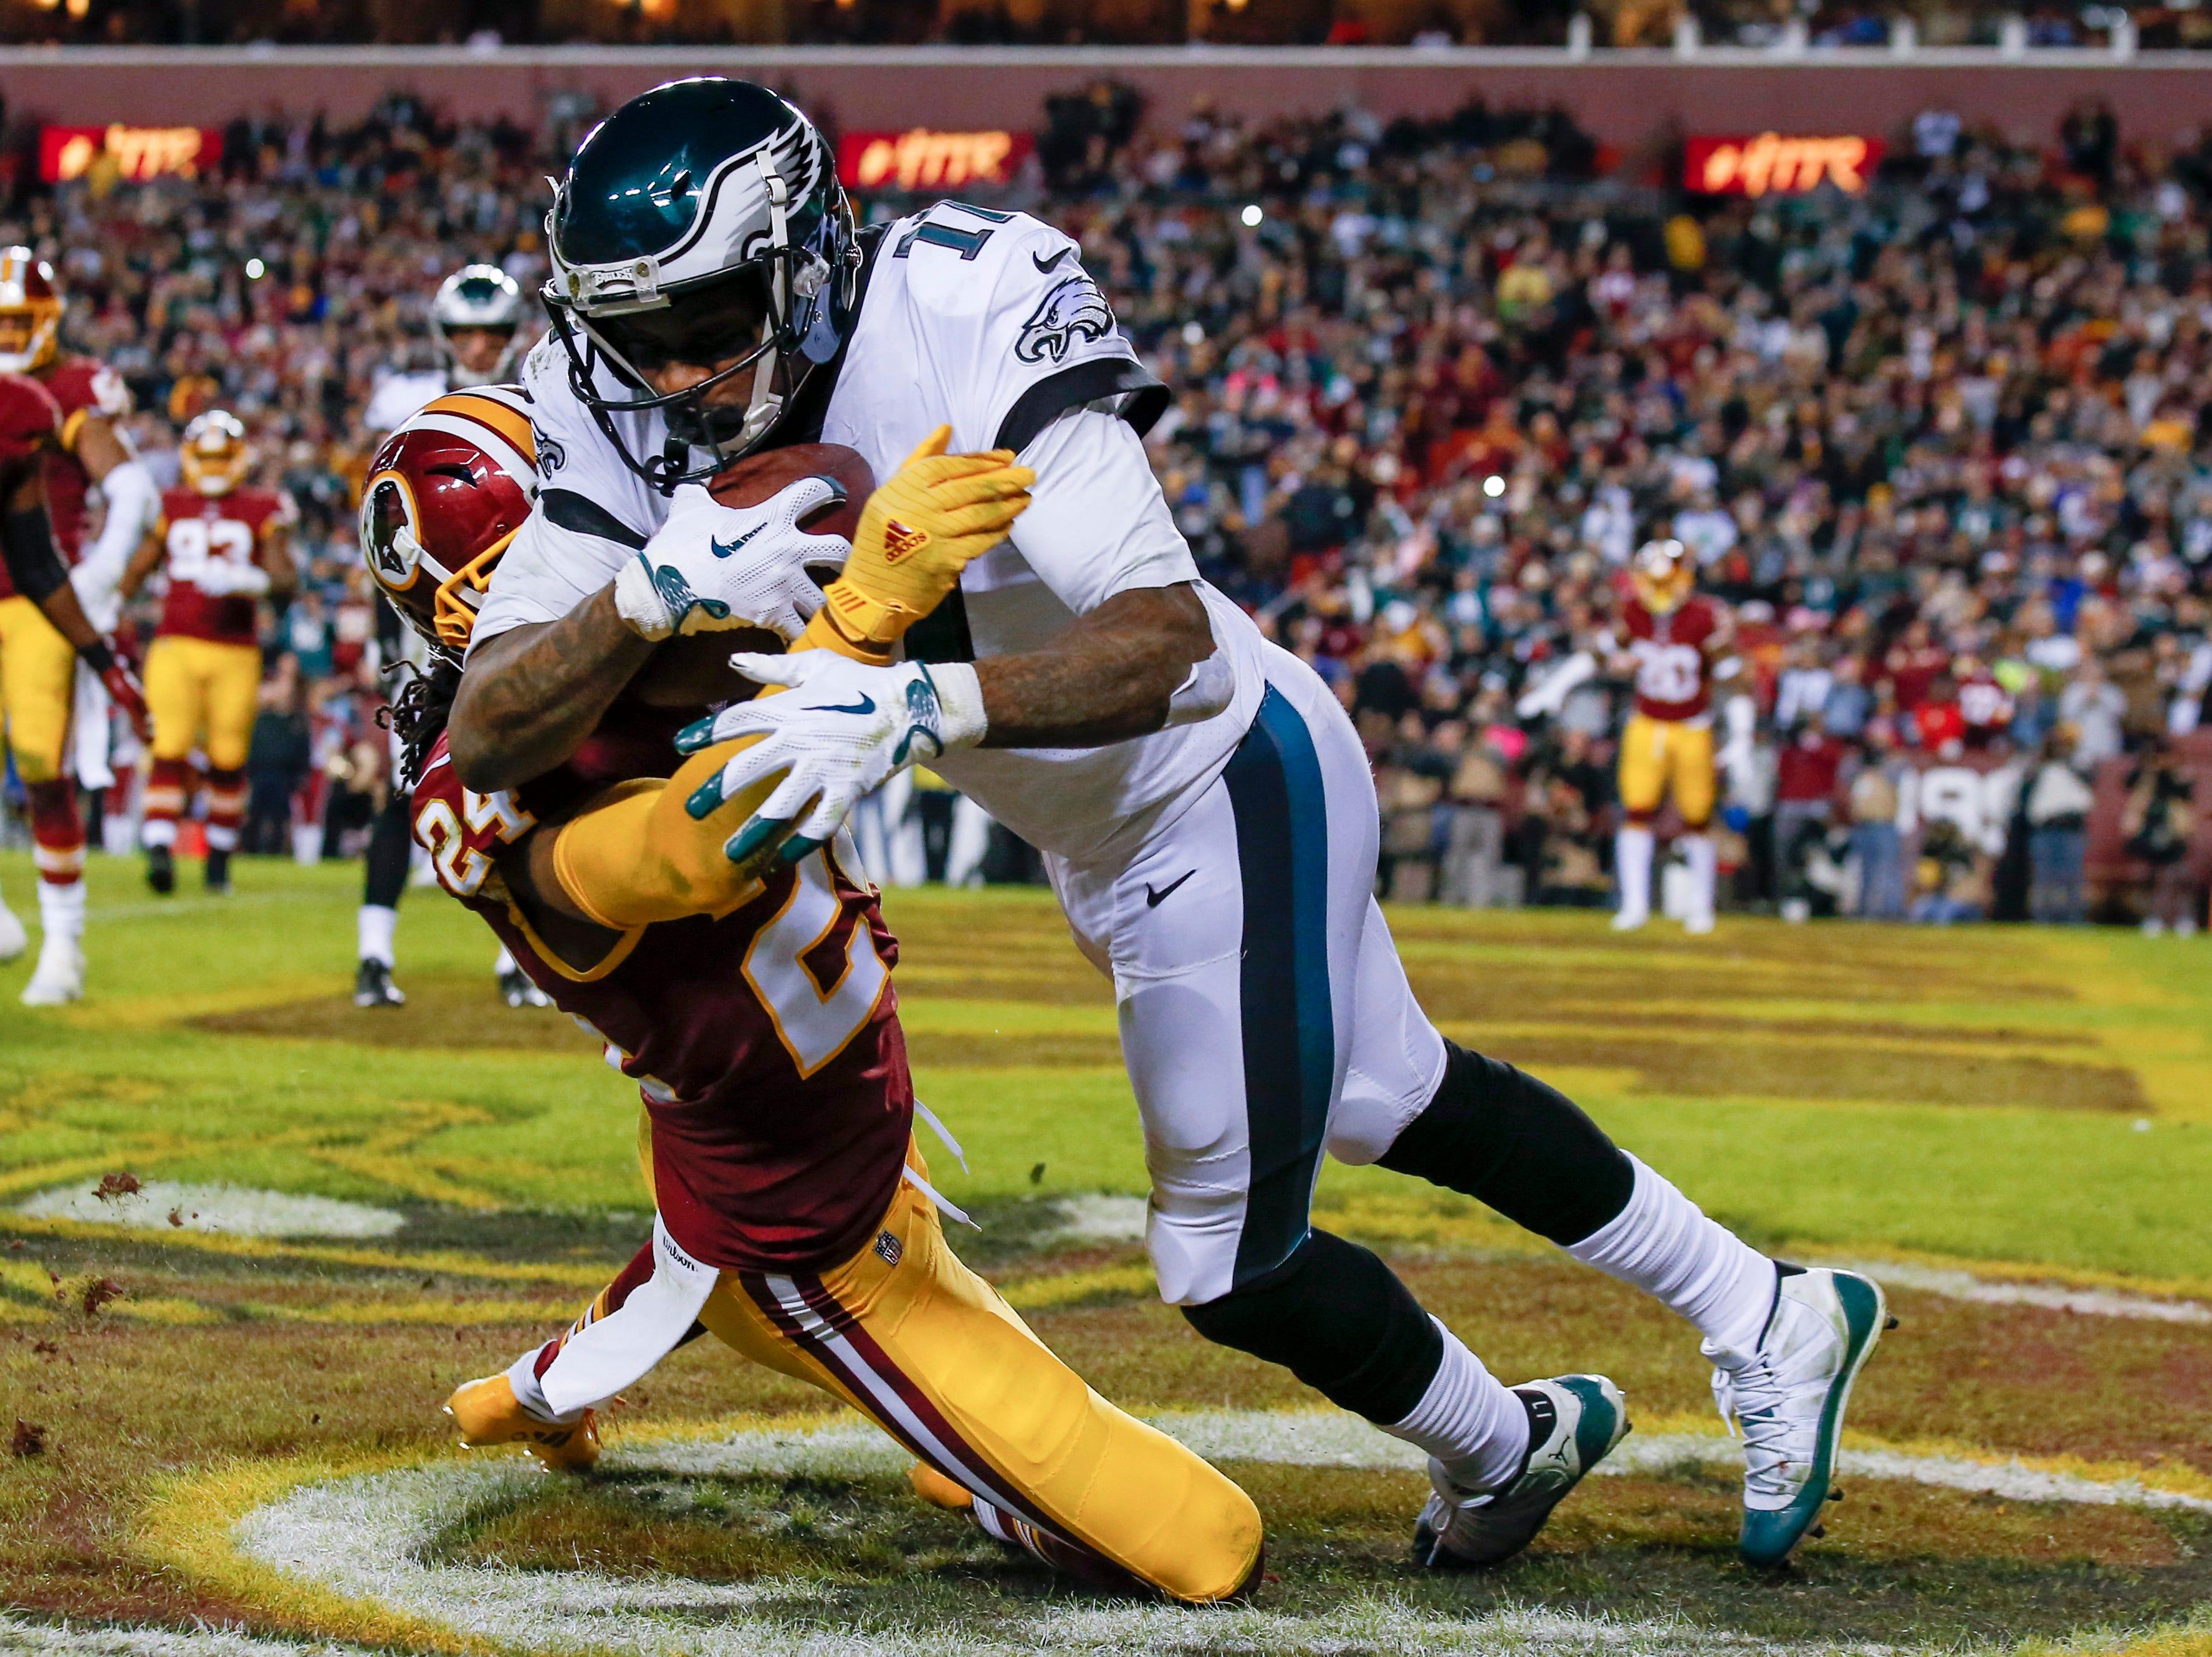 Philadelphia Eagles wide receiver Alshon Jeffery (17) pulls in a touchdown pass under pressure from Washington Redskins cornerback Josh Norman (24) during the first half of the NFL football game, Sunday, Dec. 30, 2018 in Landover, Md. (AP Photo/Alex Brandon)